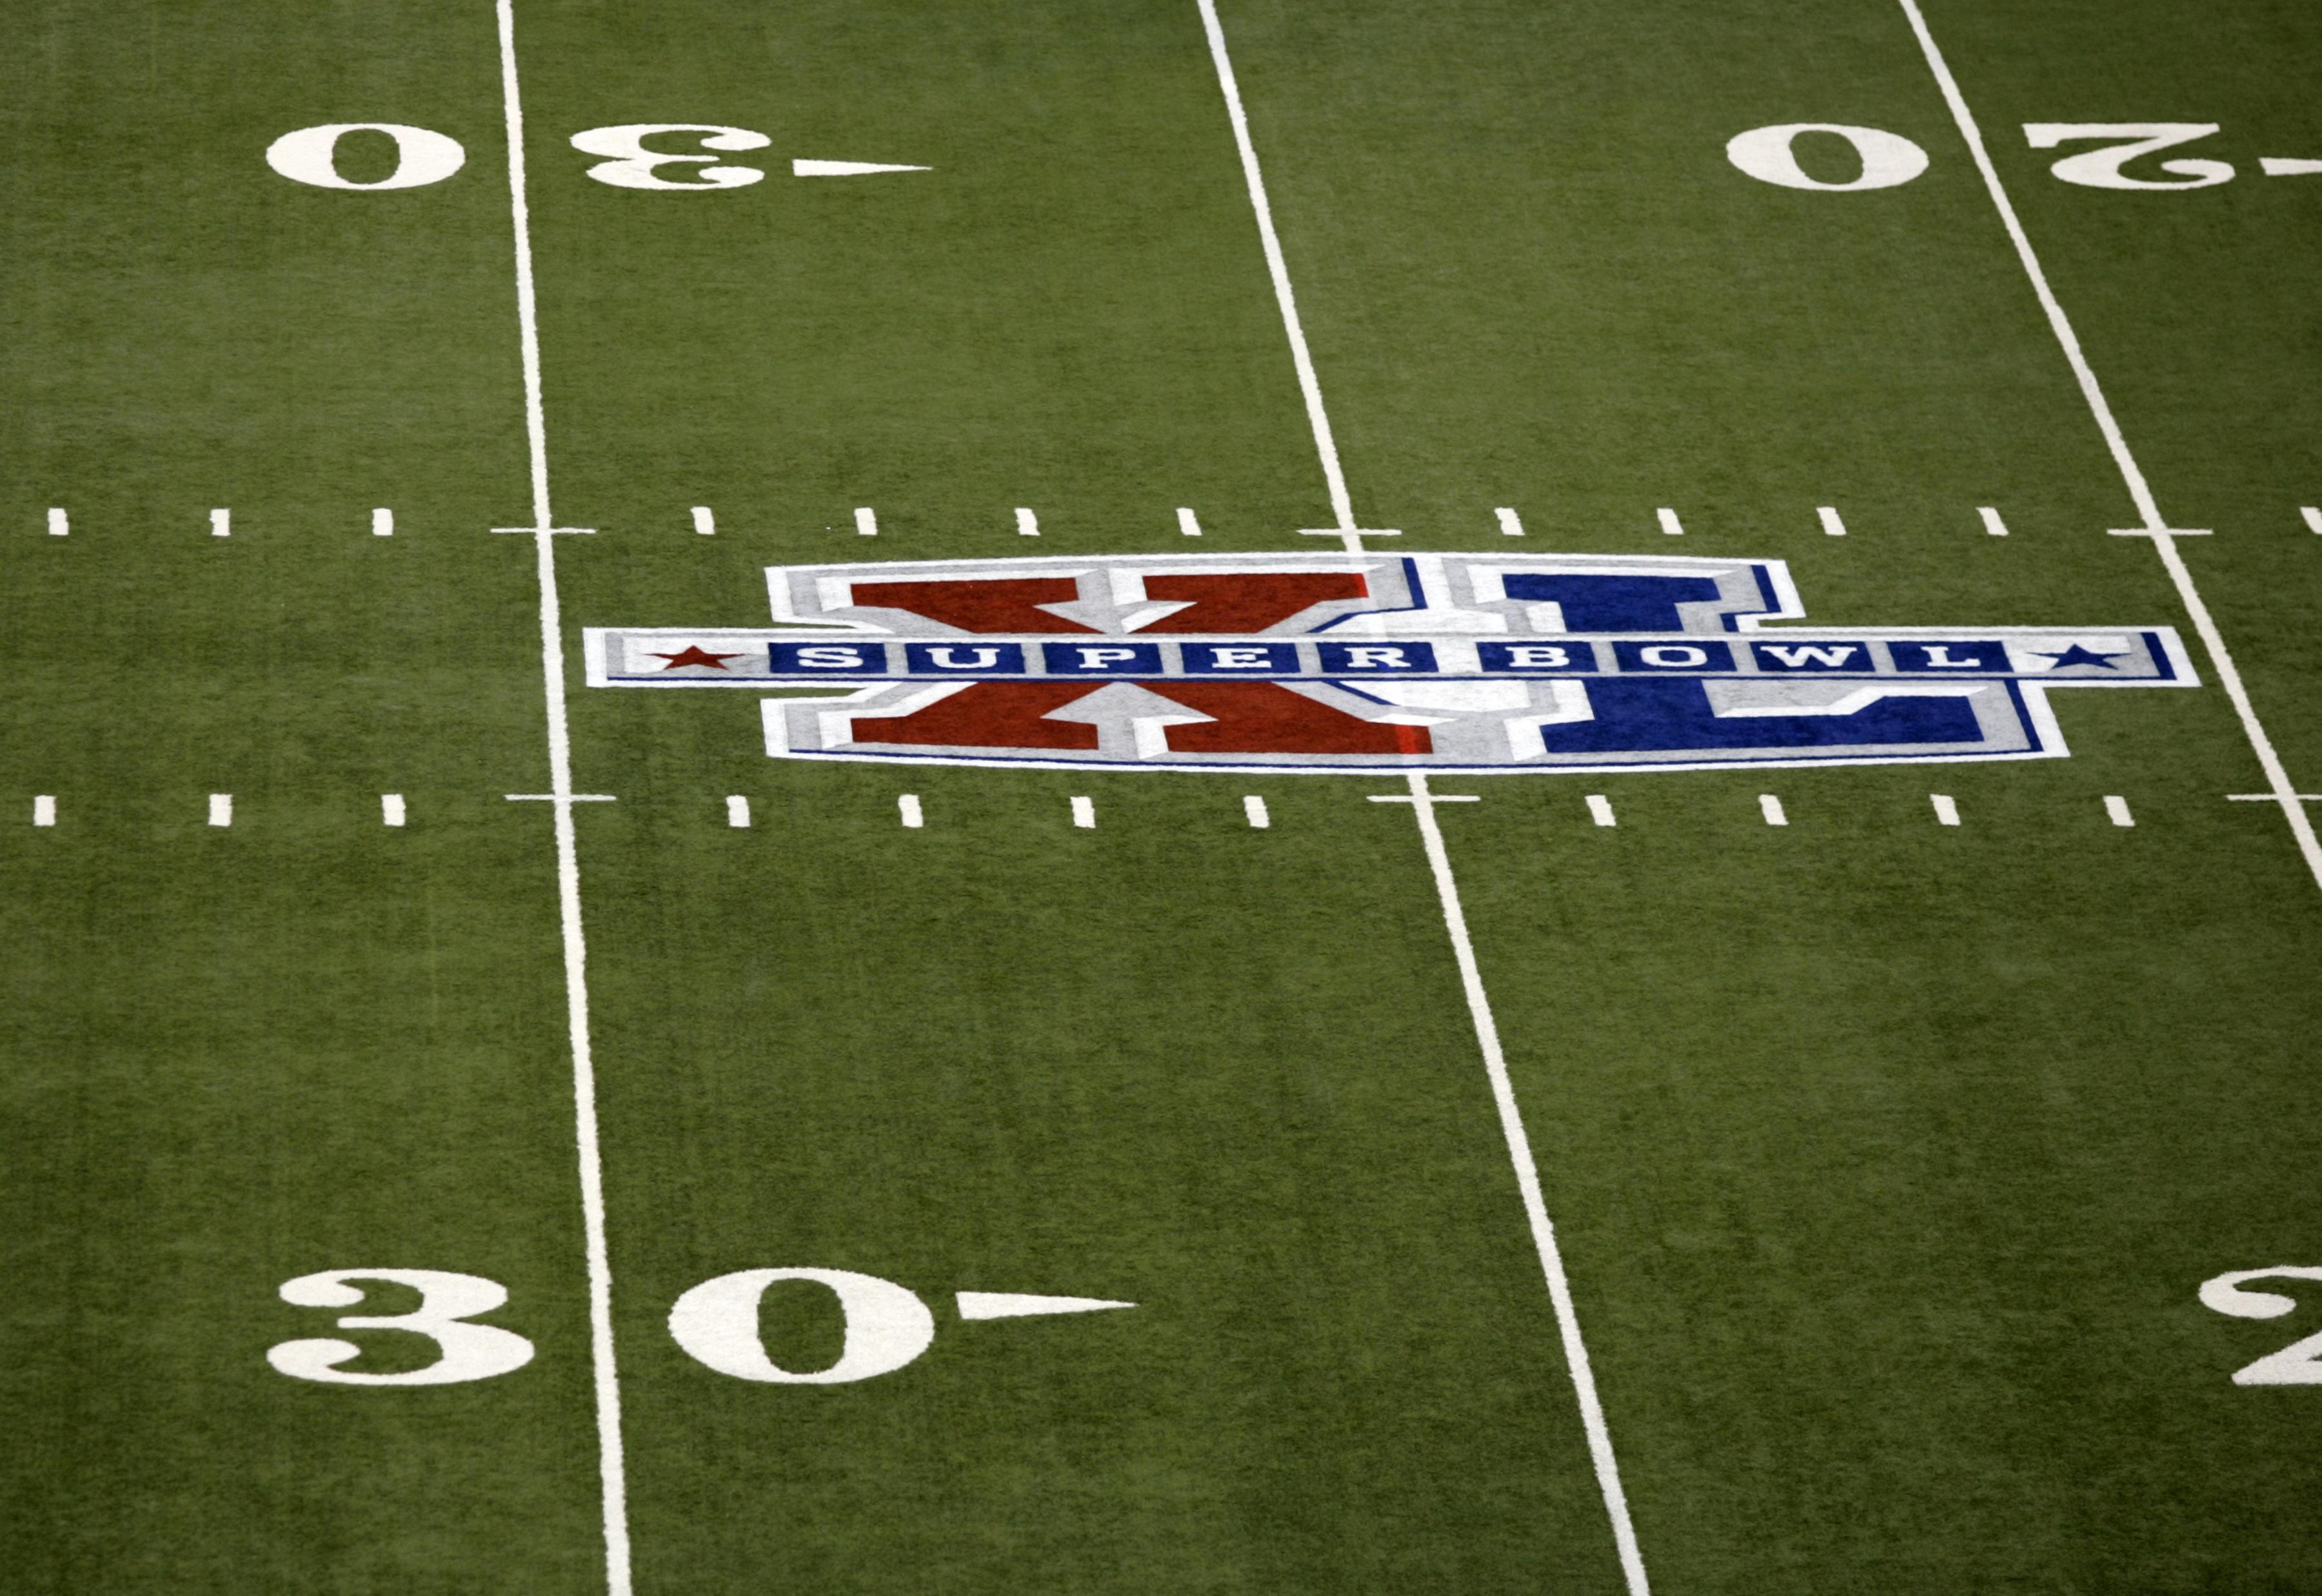 Super Bowl Results